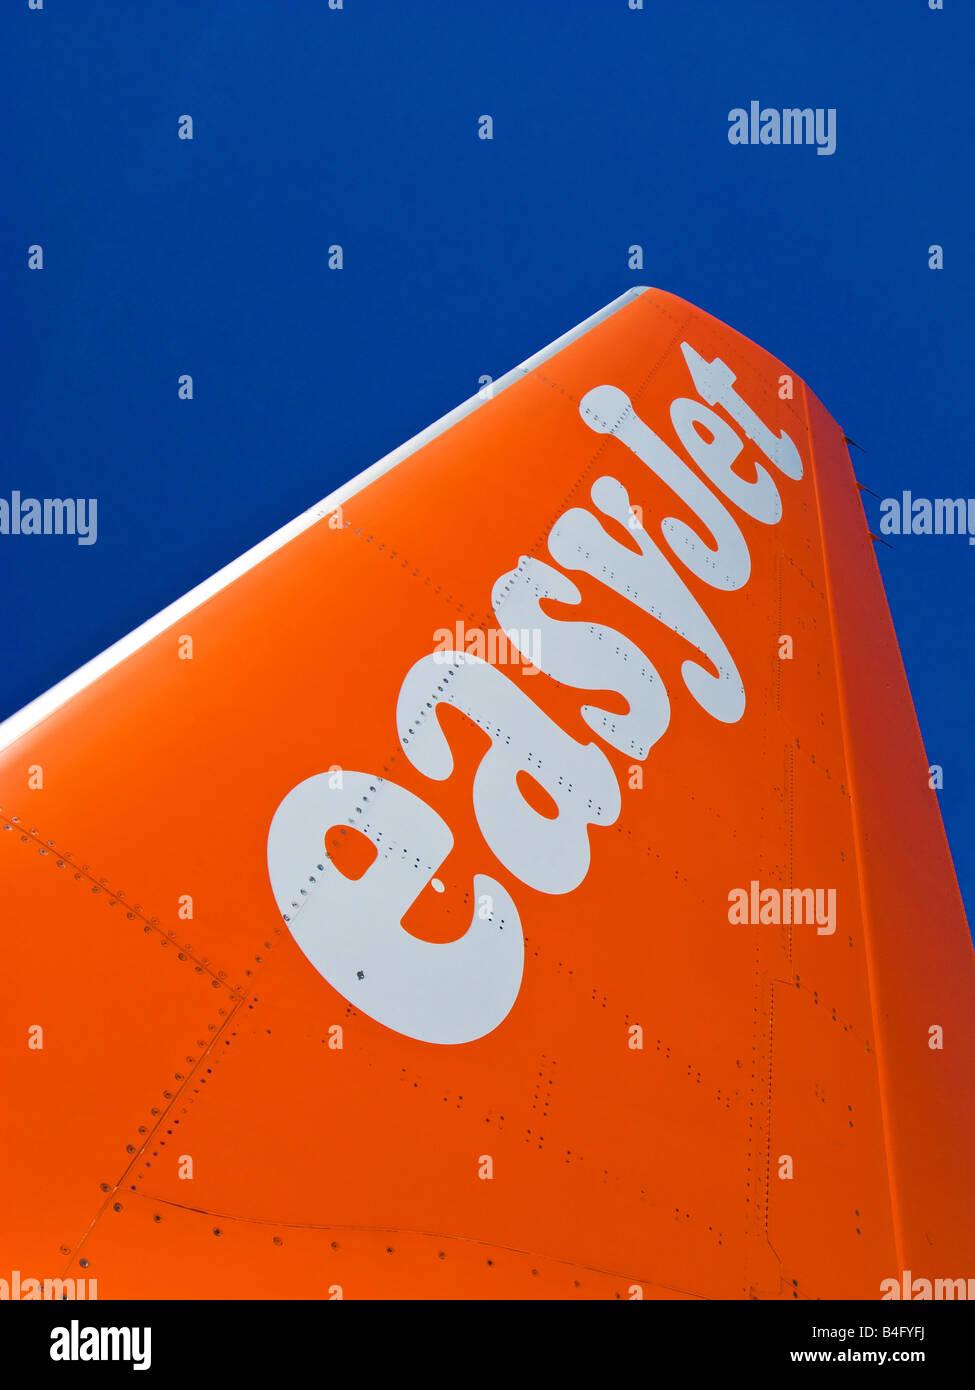 Detail of easyjet plane fin - Stock Image